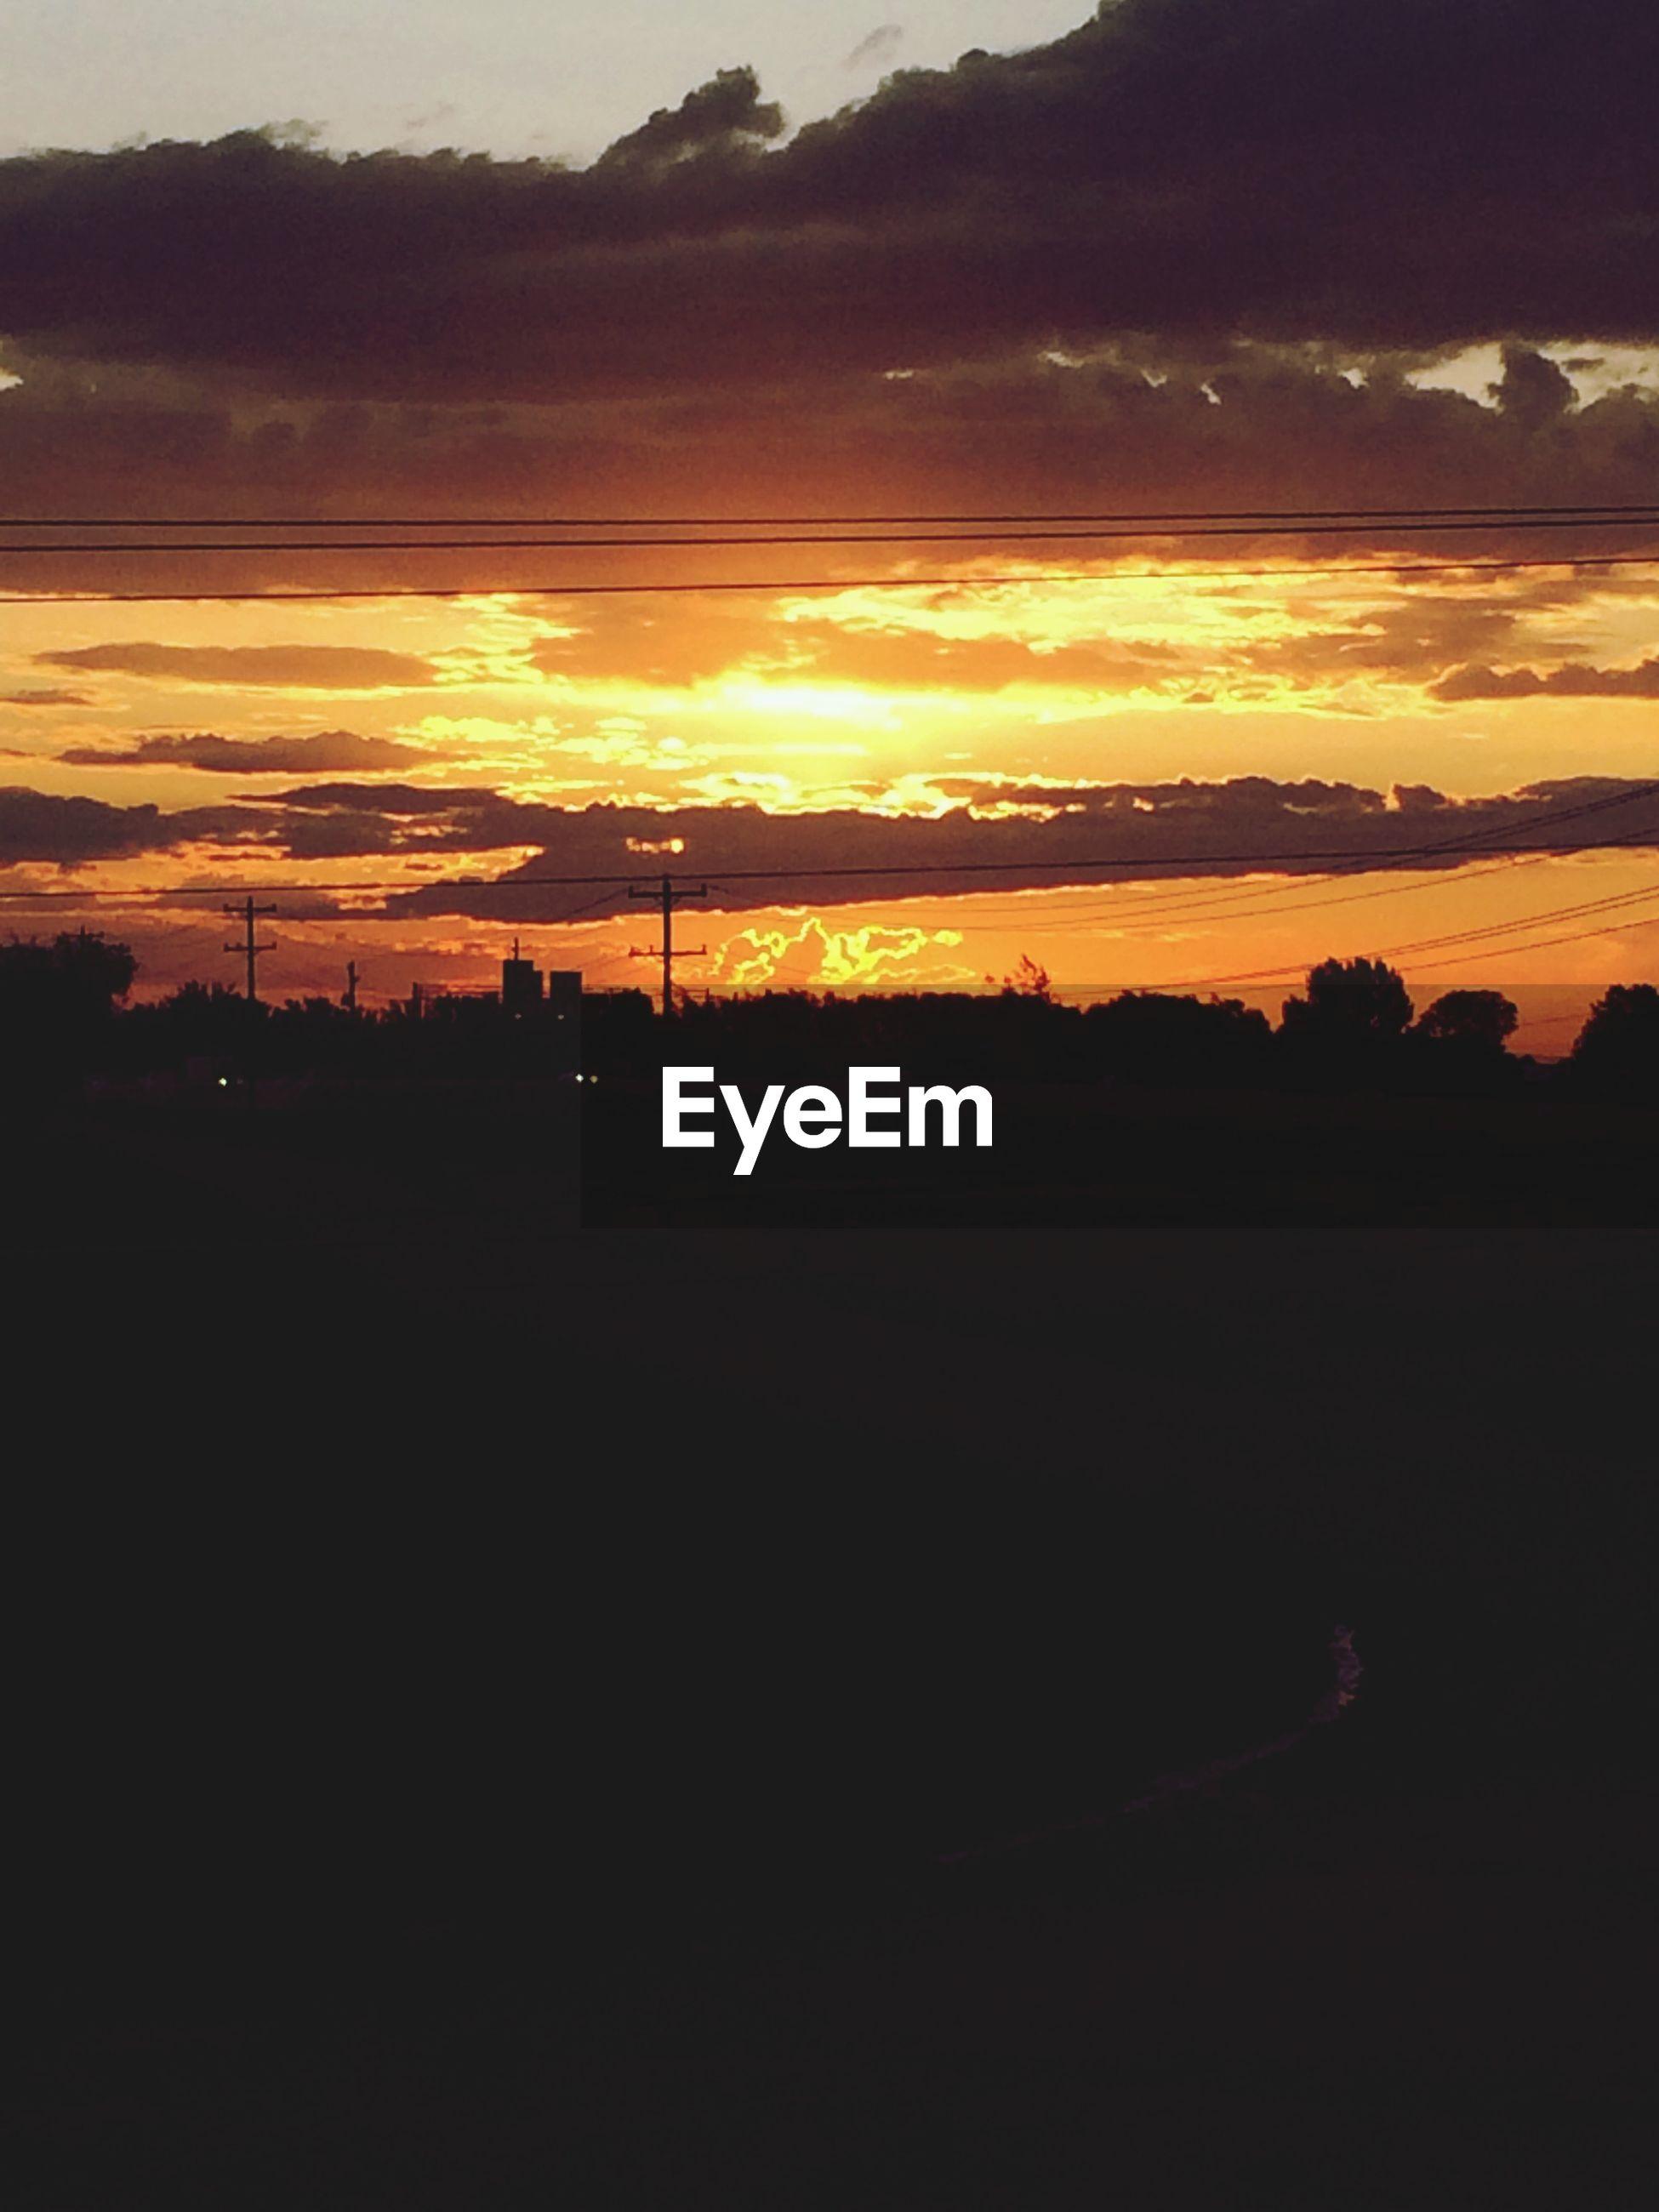 sunset, silhouette, sky, scenics, orange color, tranquil scene, beauty in nature, tranquility, cloud - sky, idyllic, nature, dark, sun, cloud, dramatic sky, tree, landscape, water, outdoors, no people